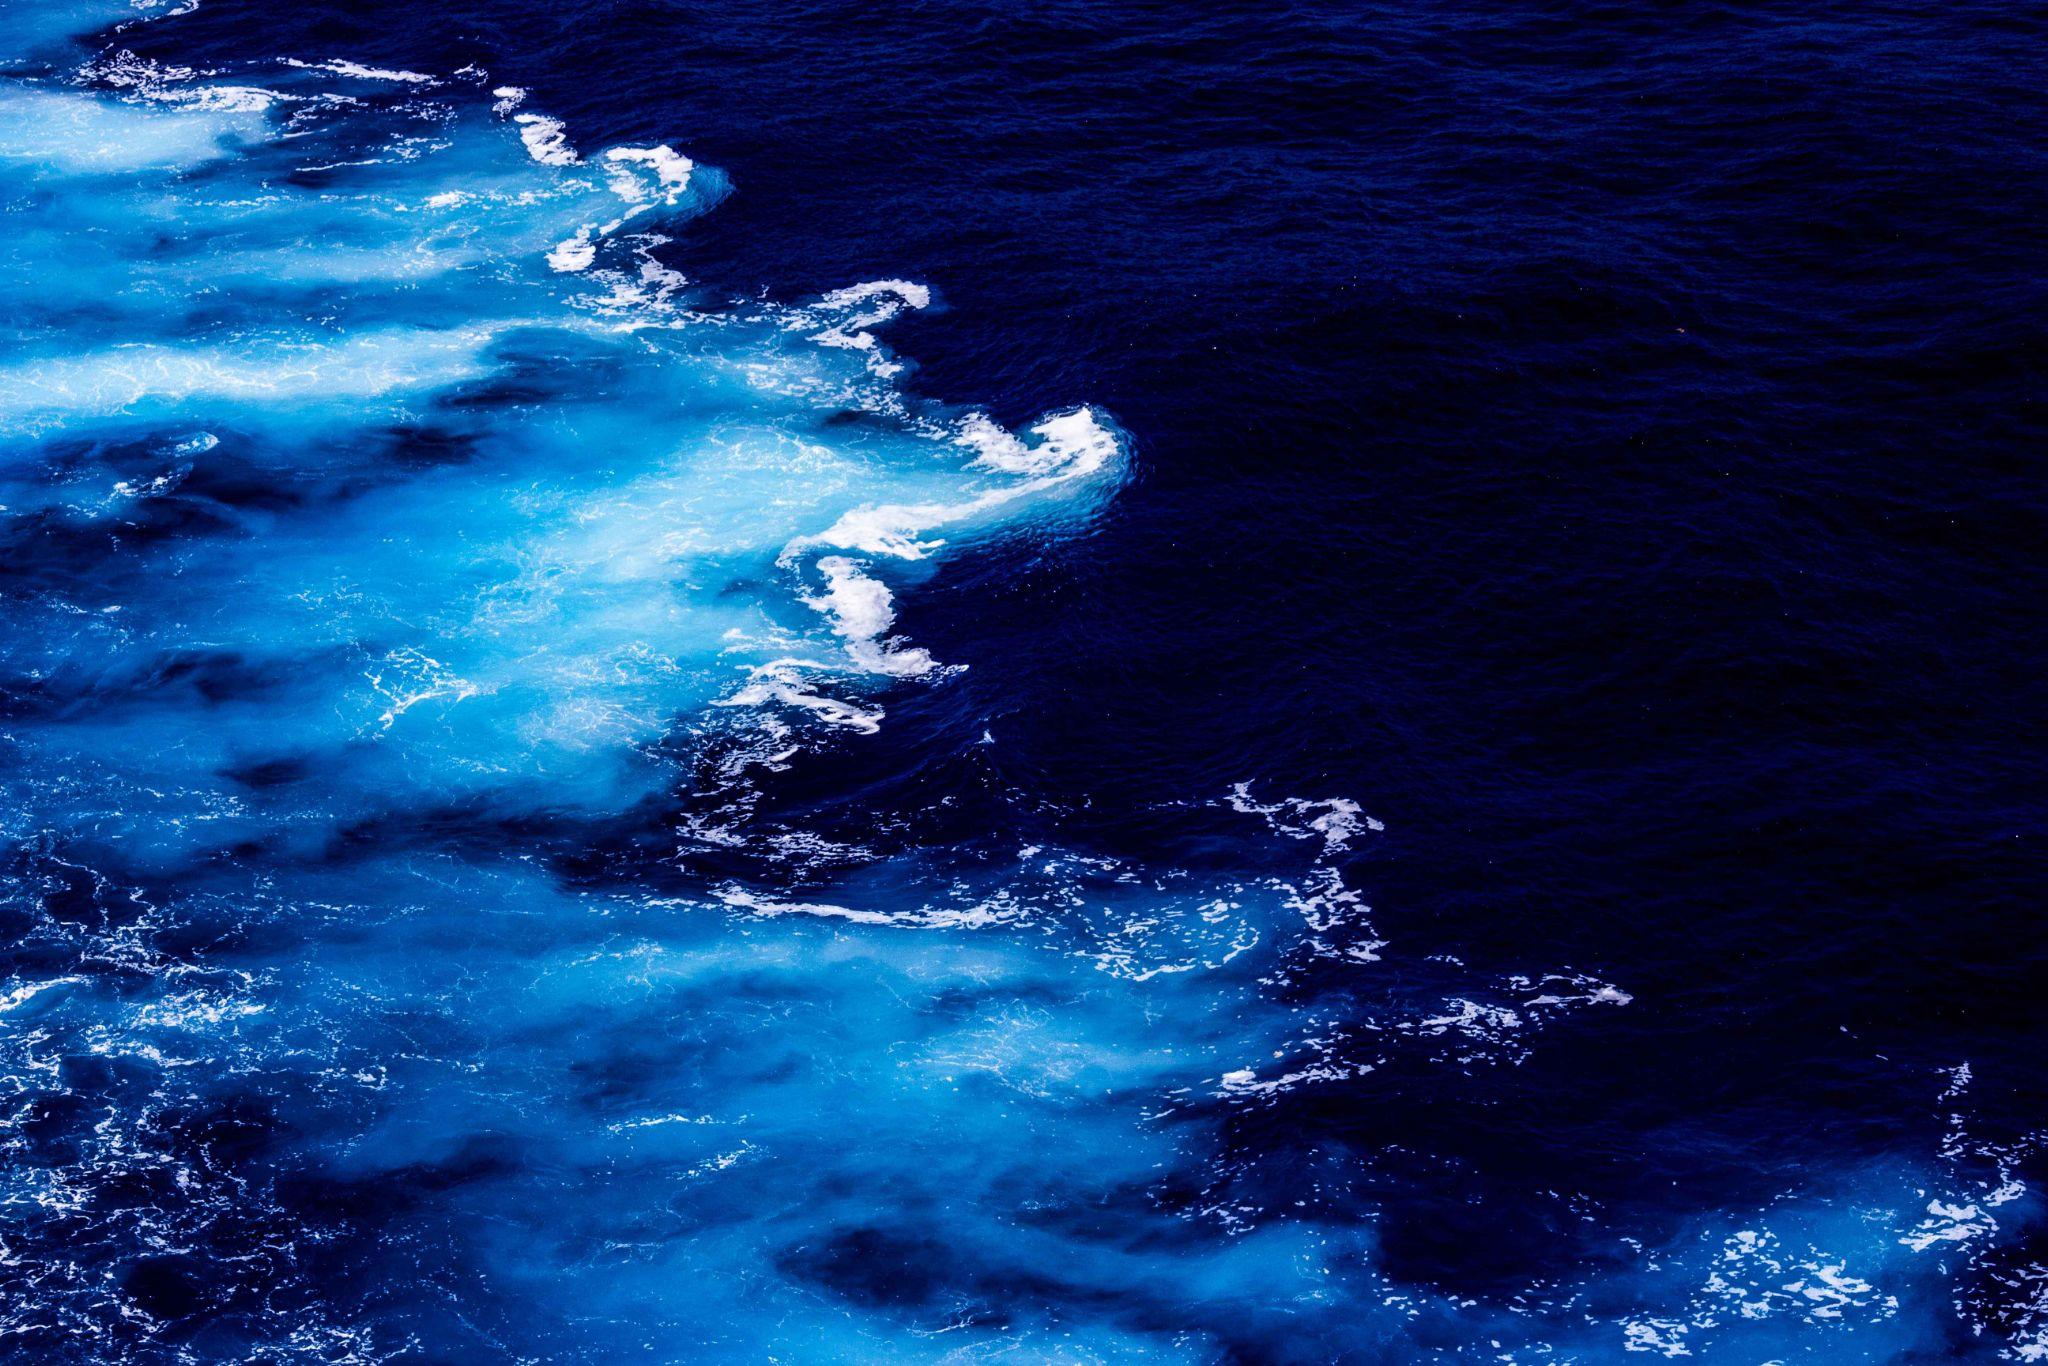 THE OCEAN BLUE by Harry Smit